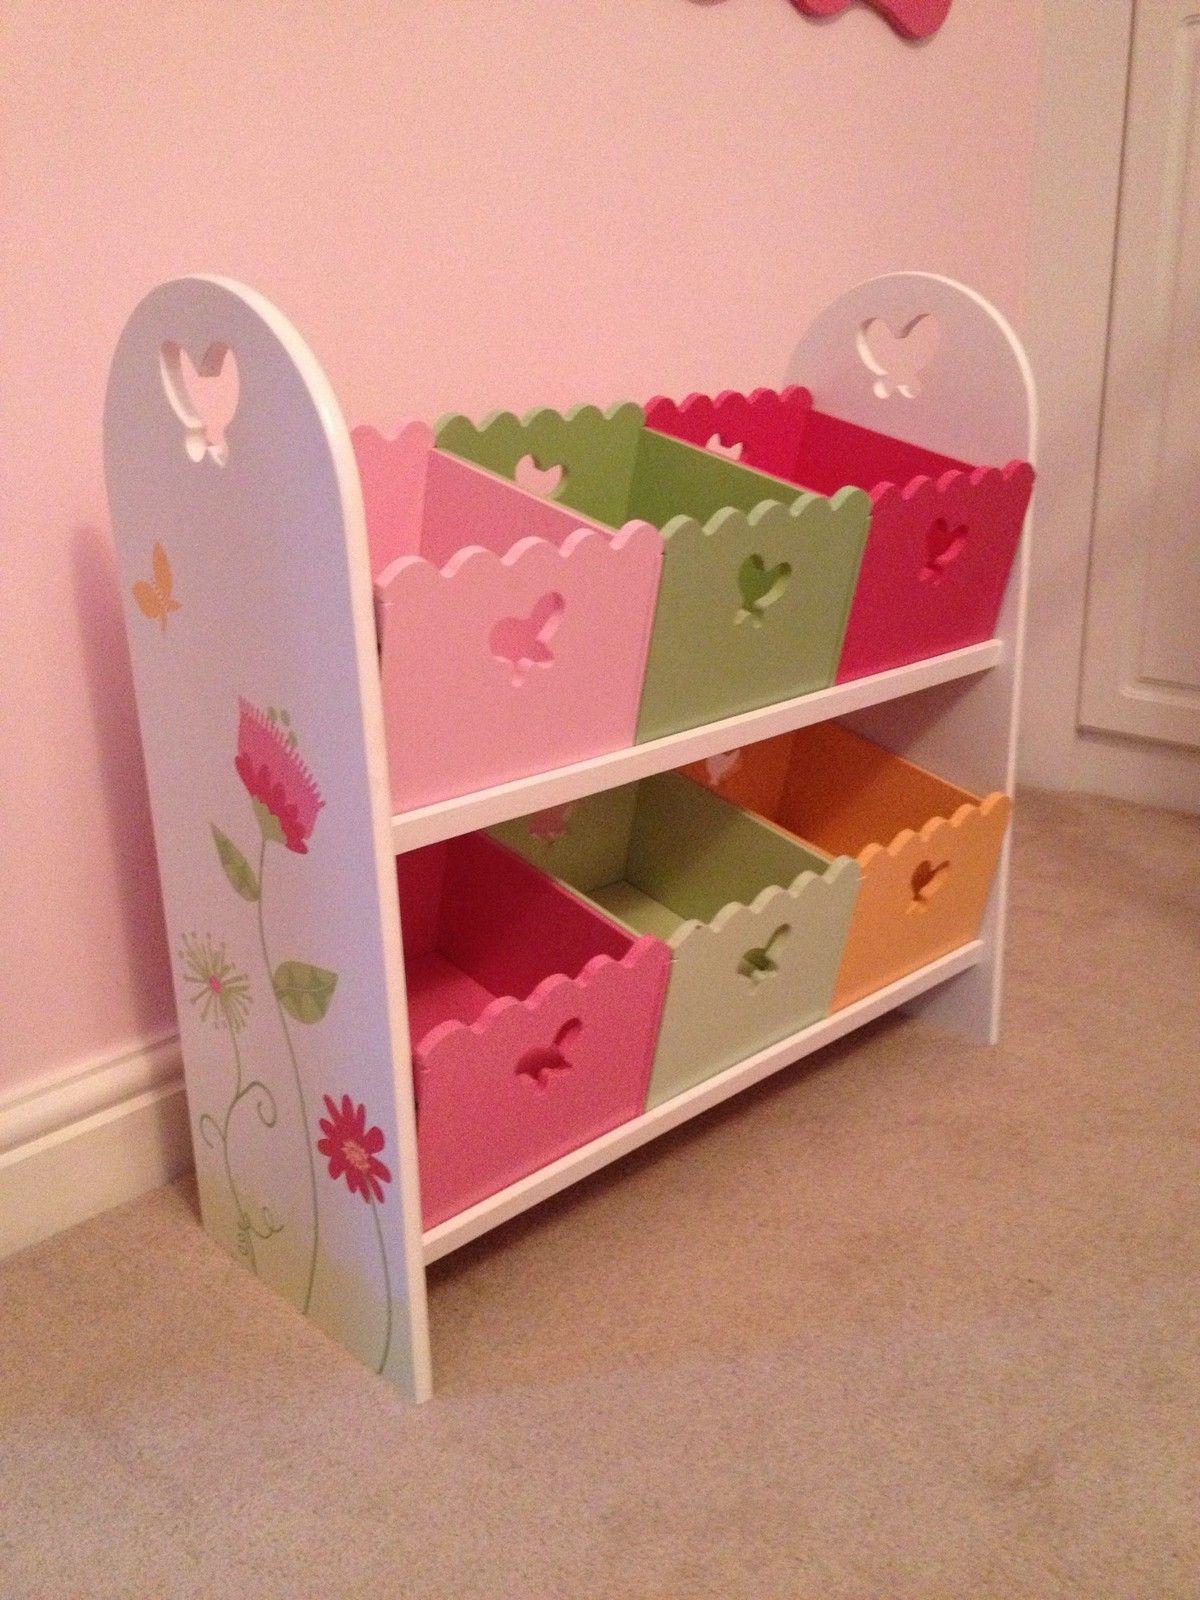 ☆VERTBAUDET☆Wooden Storage Unit Toy Box Shelves☆Girls Kids Room☆ Uk.